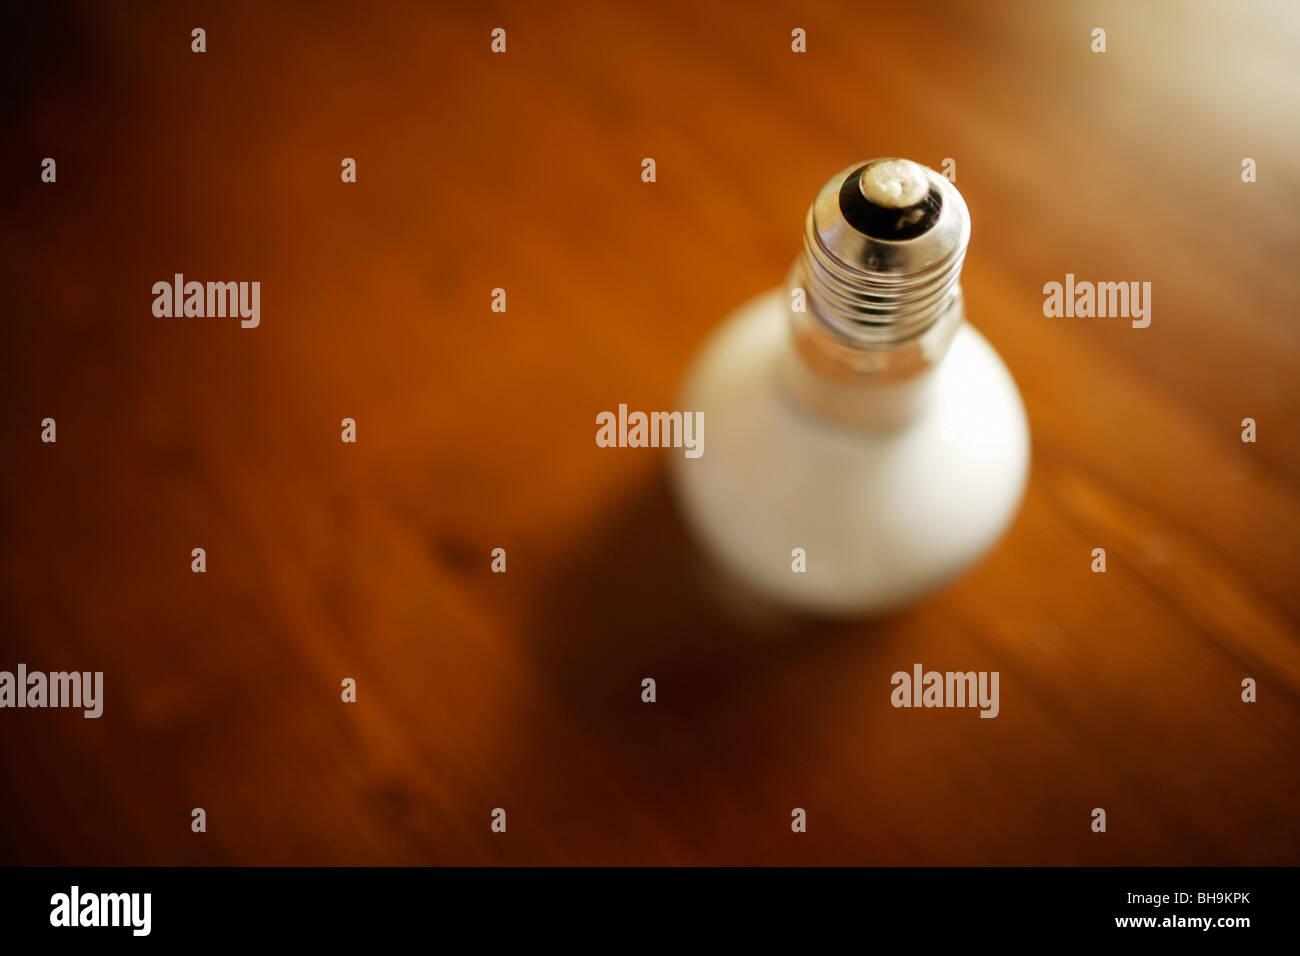 Schrauben passen Glühbirne Stockbild